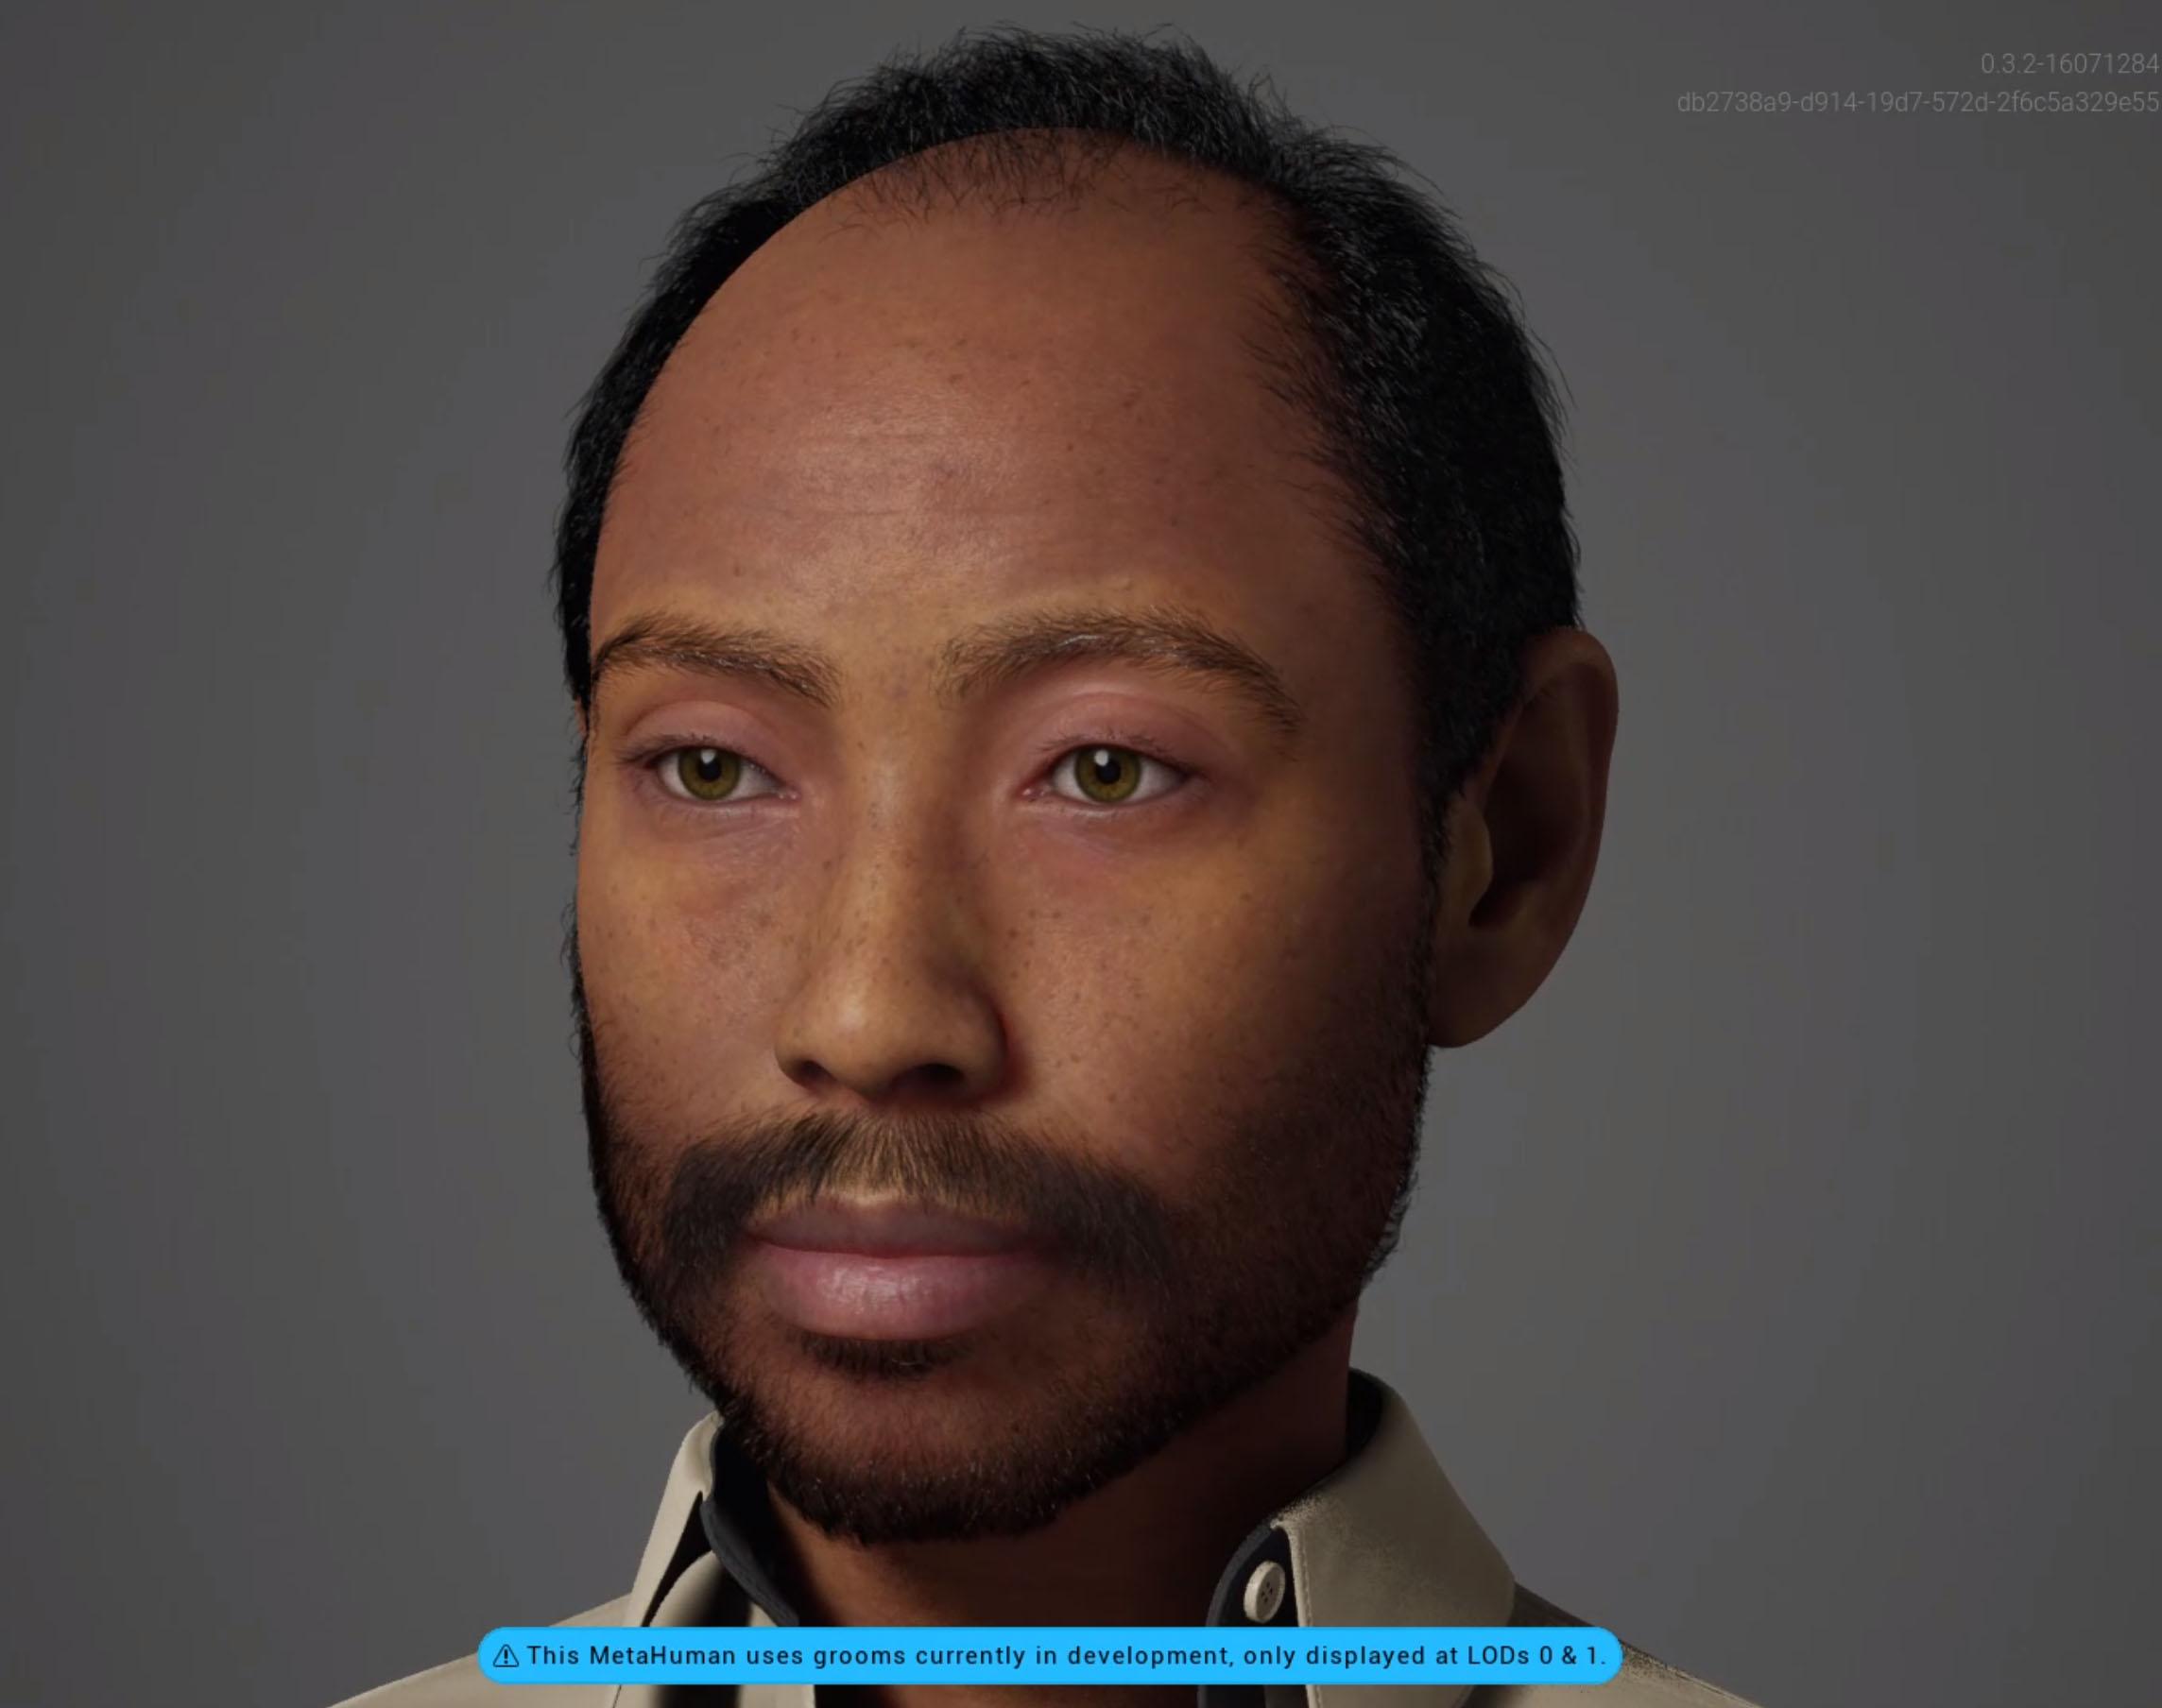 This is Murat a MetaHuman created with the Unreal Engine Metahuman Creator